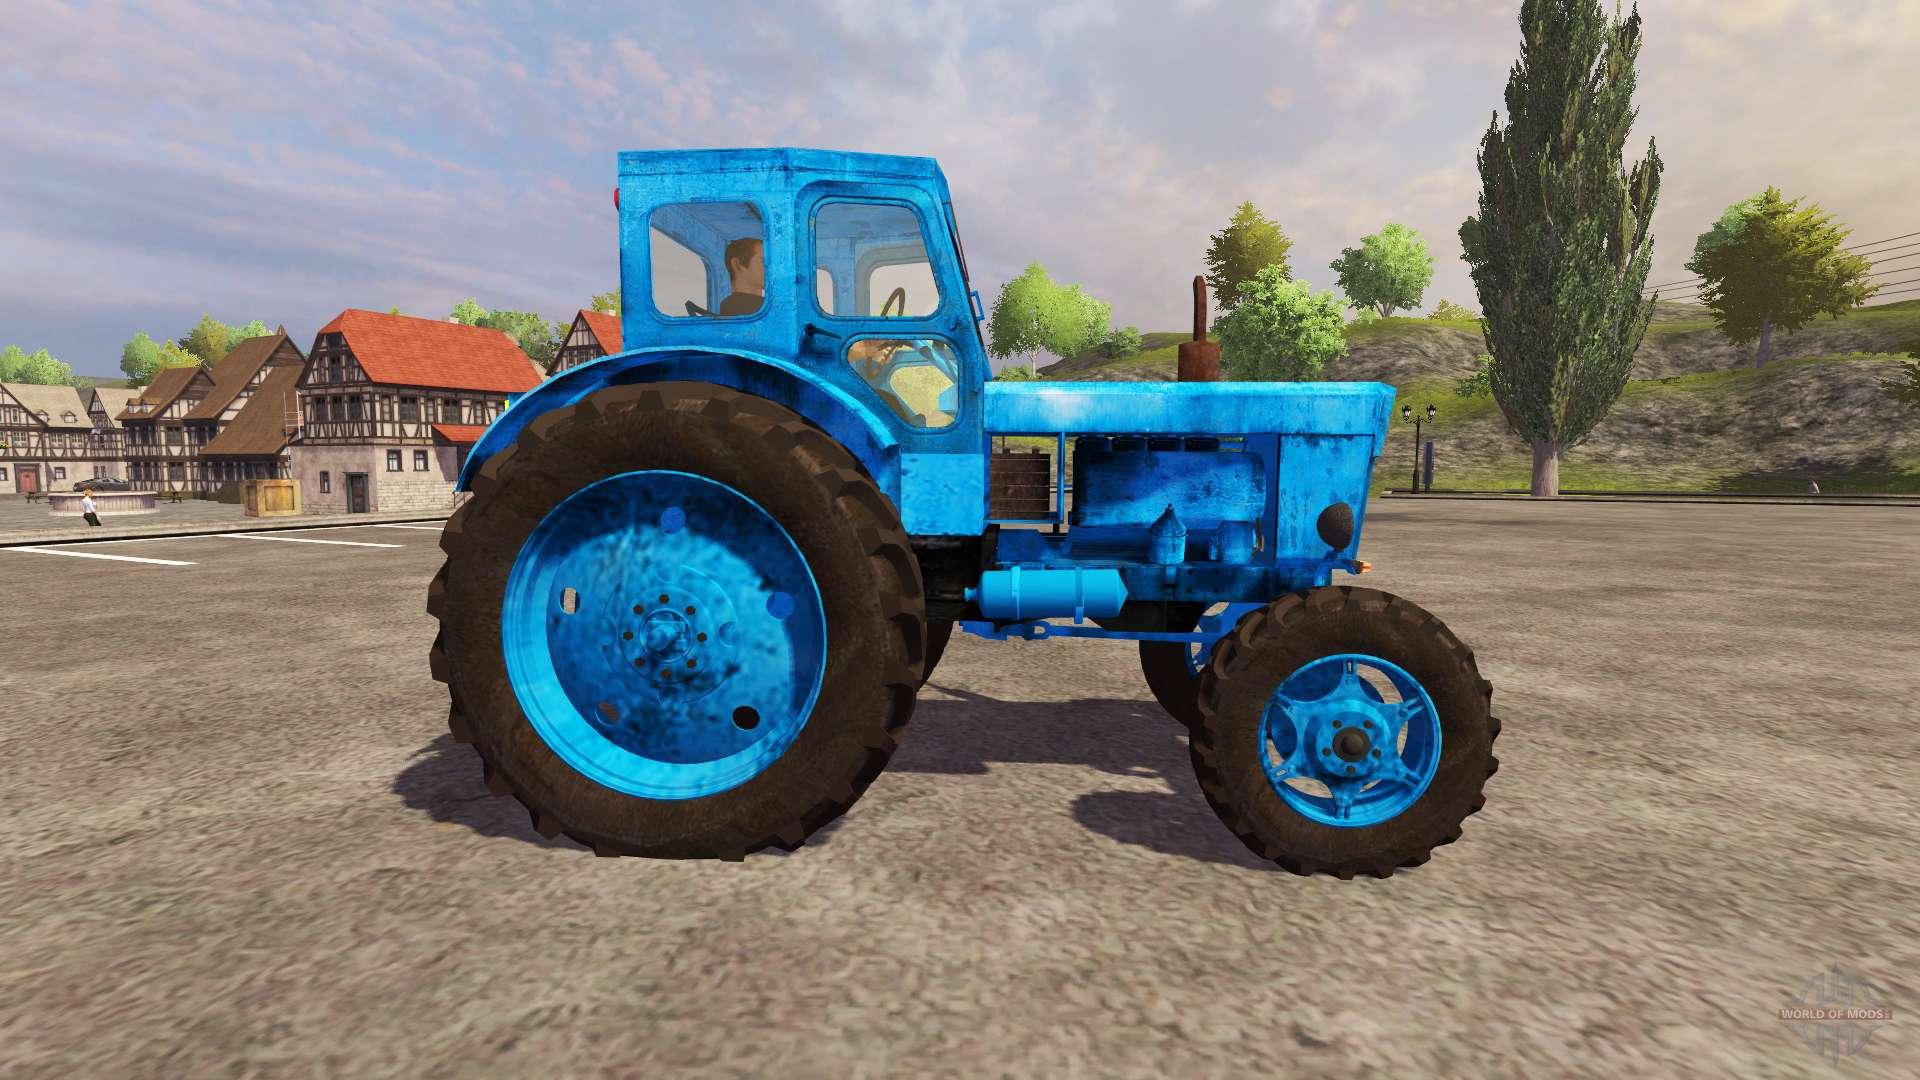 Трактор мтз-82. Цена 210 рублей